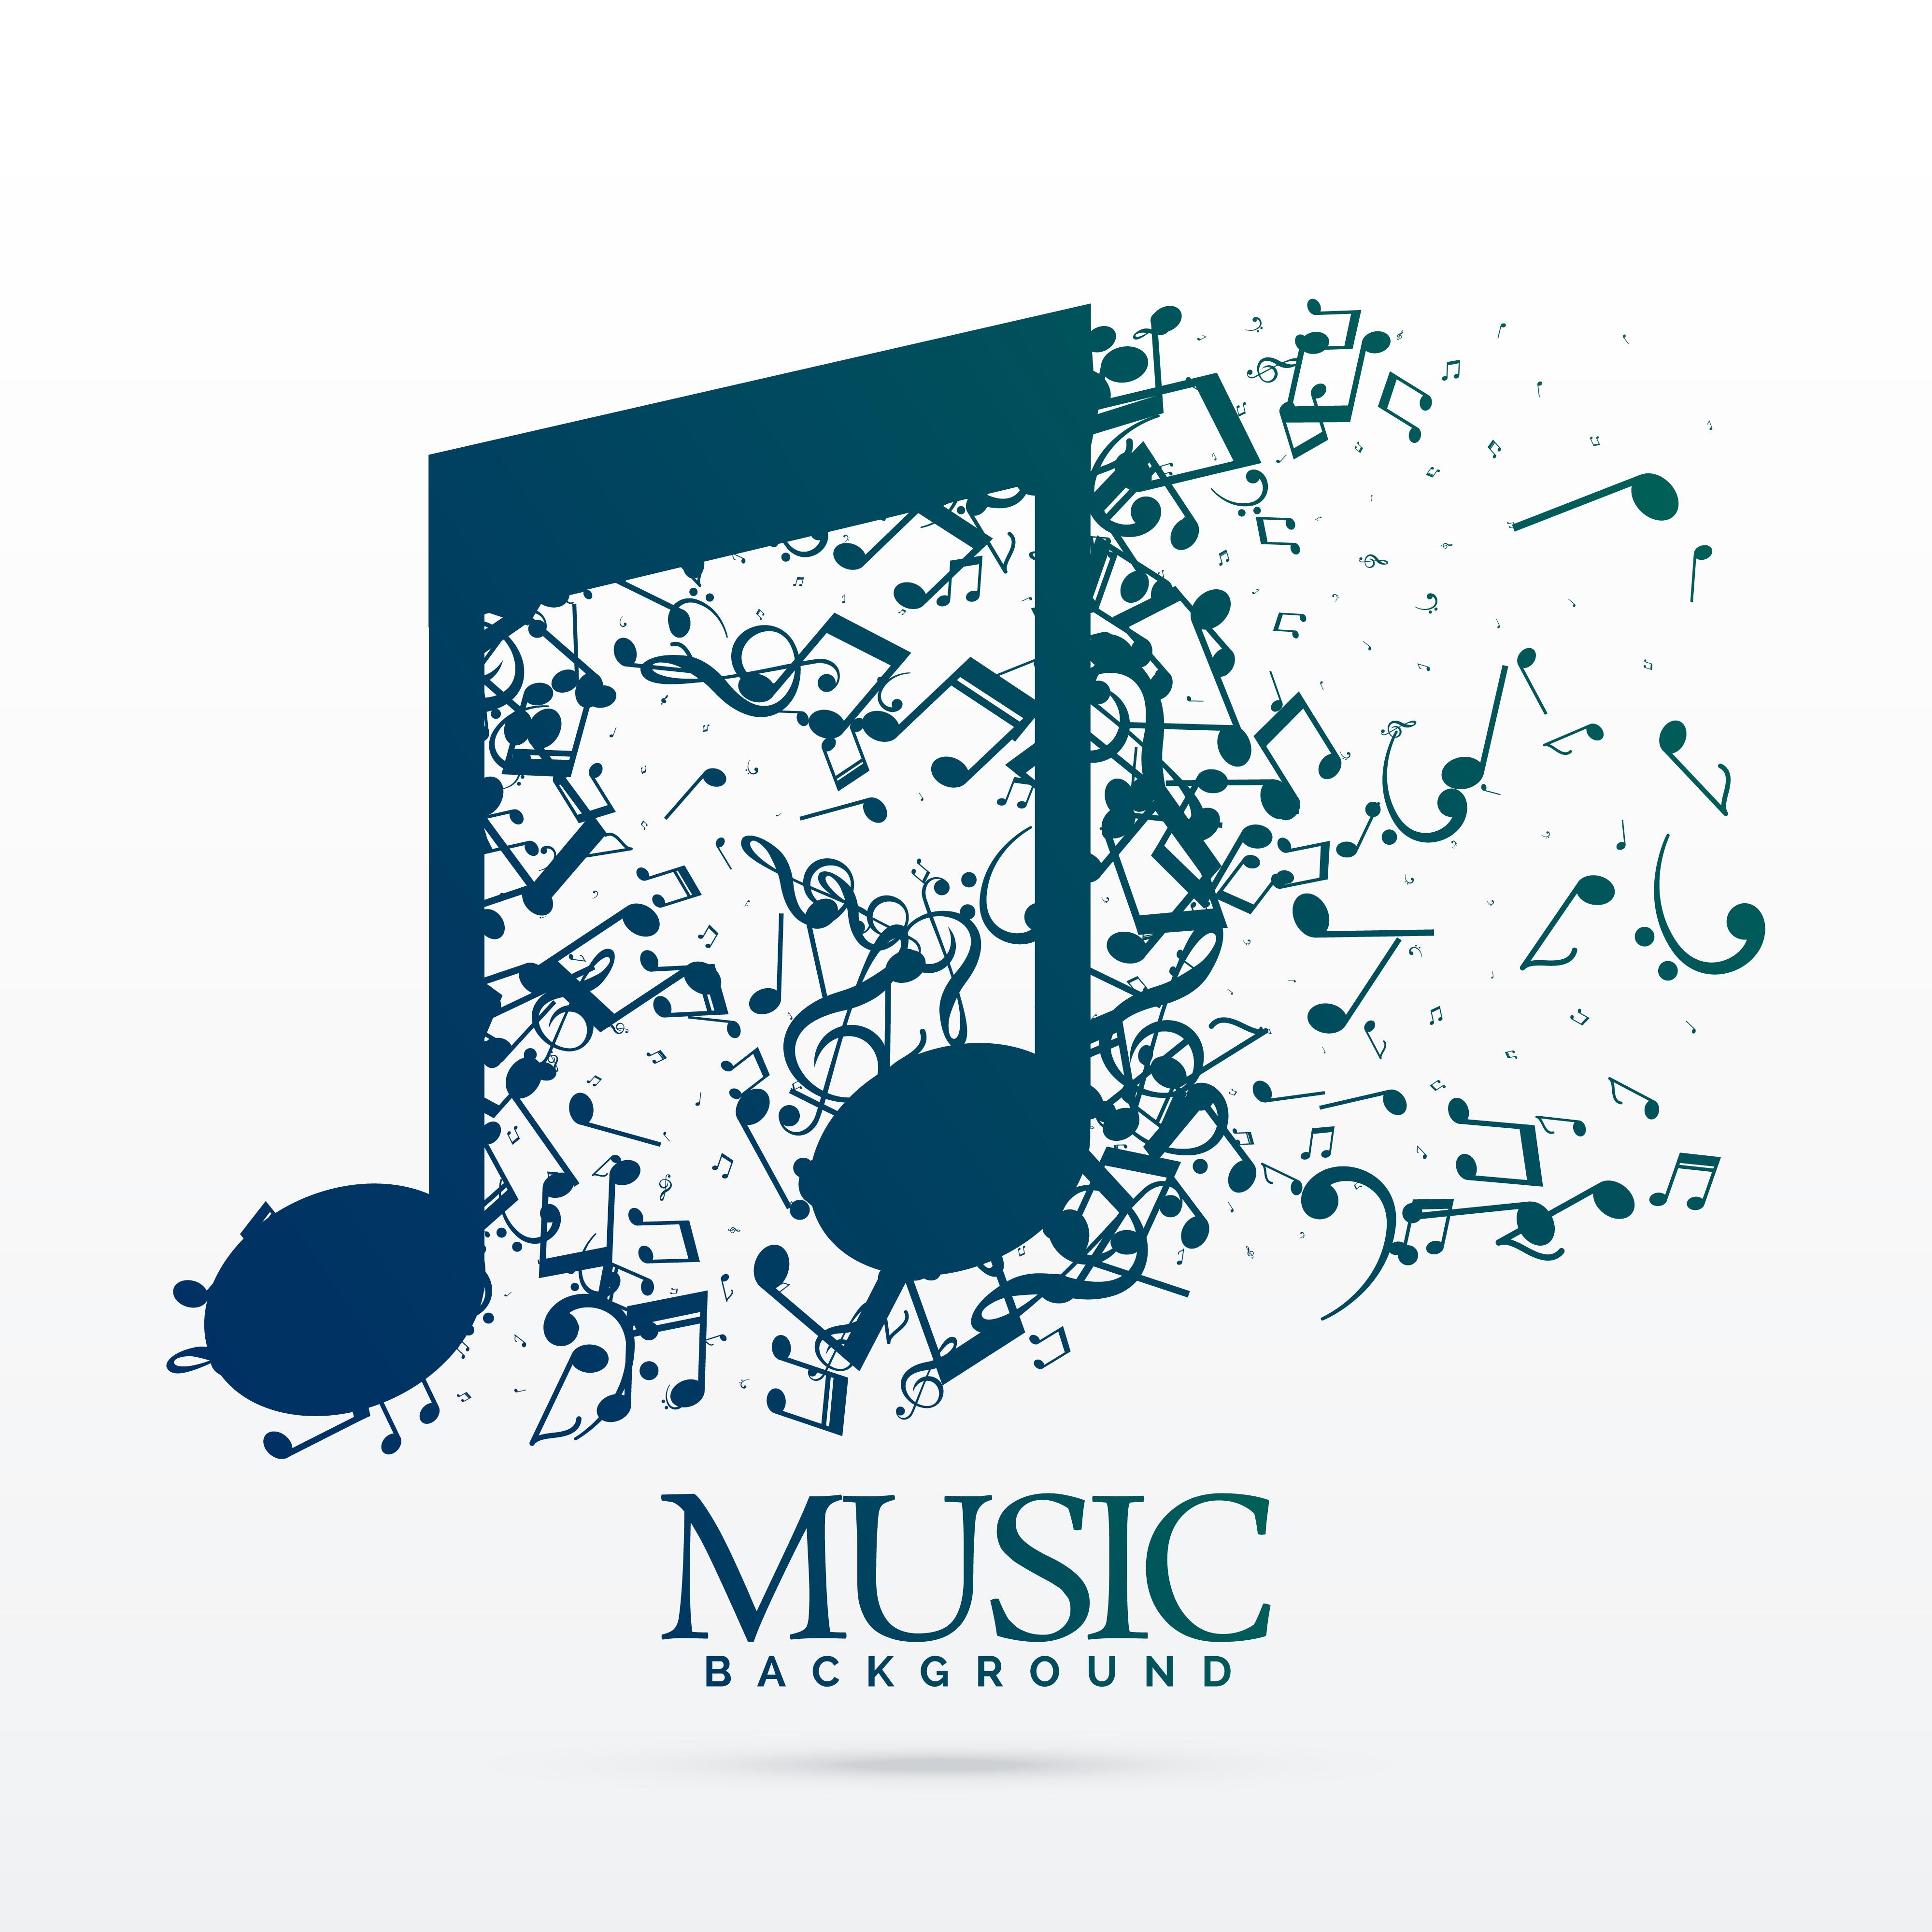 Musical Free Vector Art - (3793 Free Downloads)